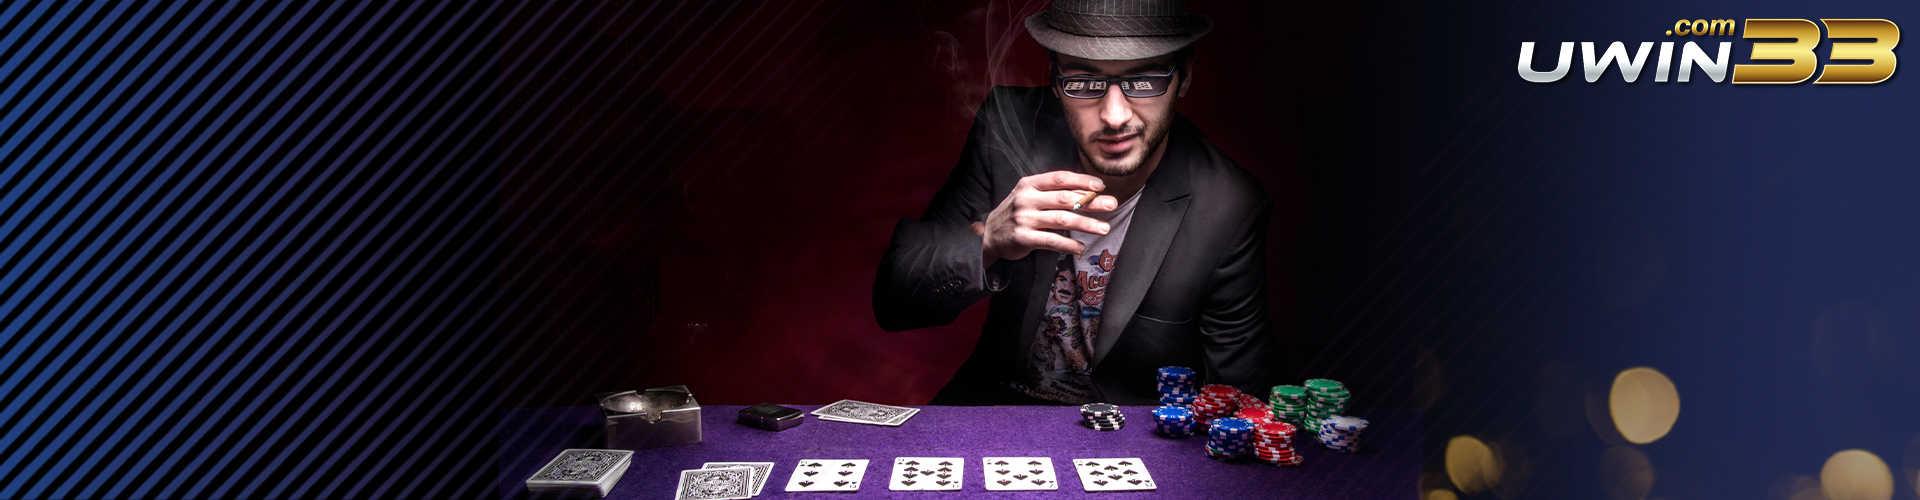 Slot Machine Games spinning